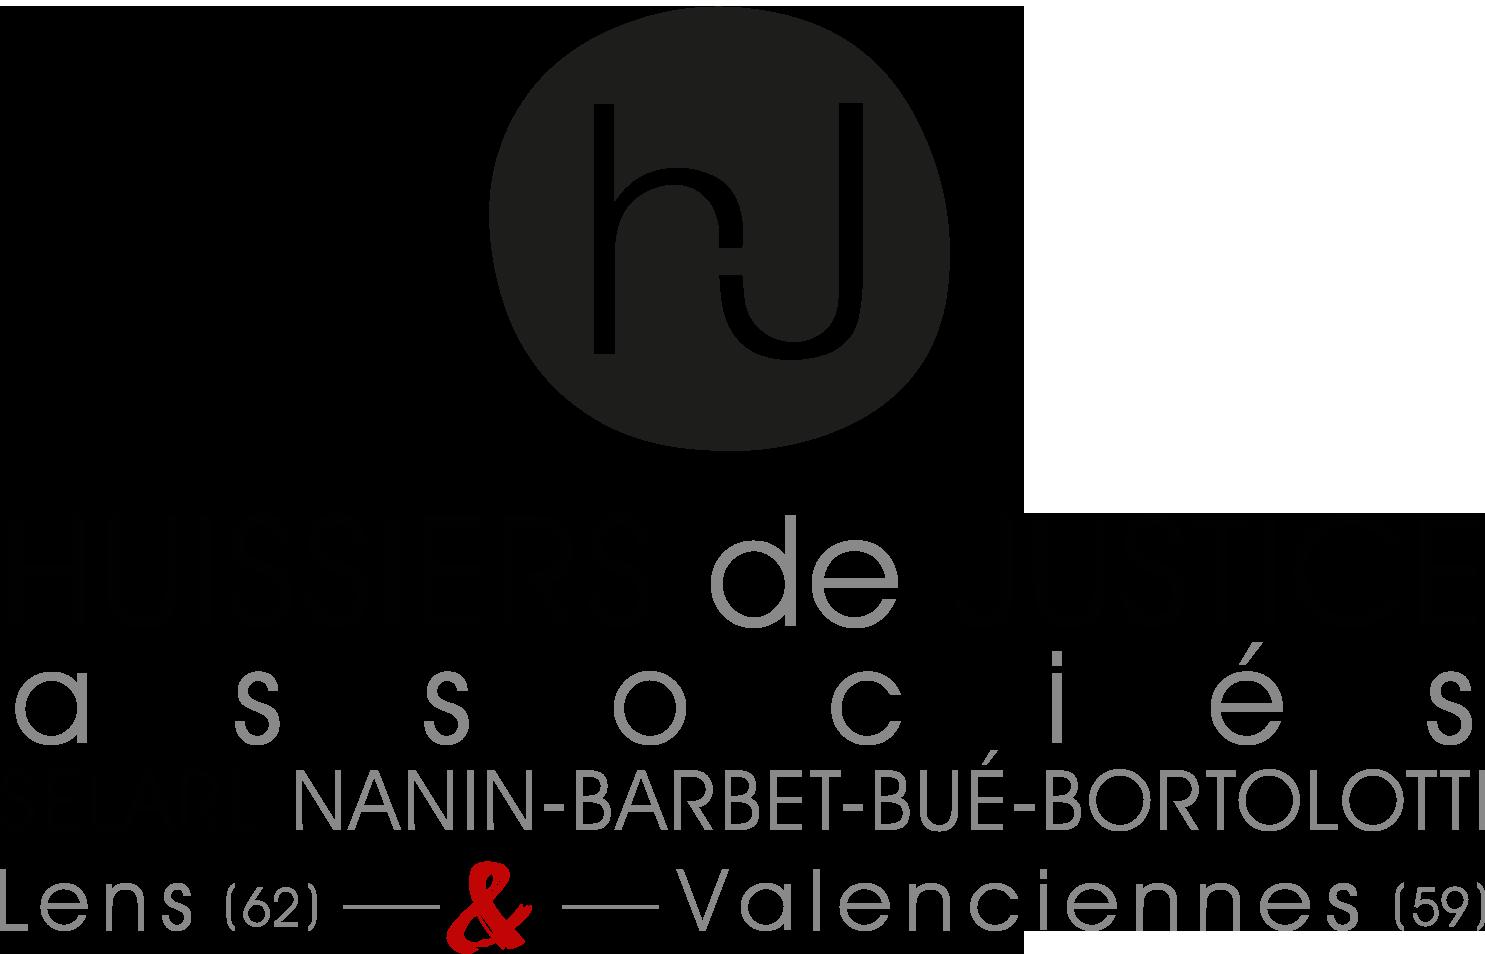 SELARL NANIN - BARBET - BUE - BORTOLOTTI Huissiers de Justice à Lens dans le  (62)